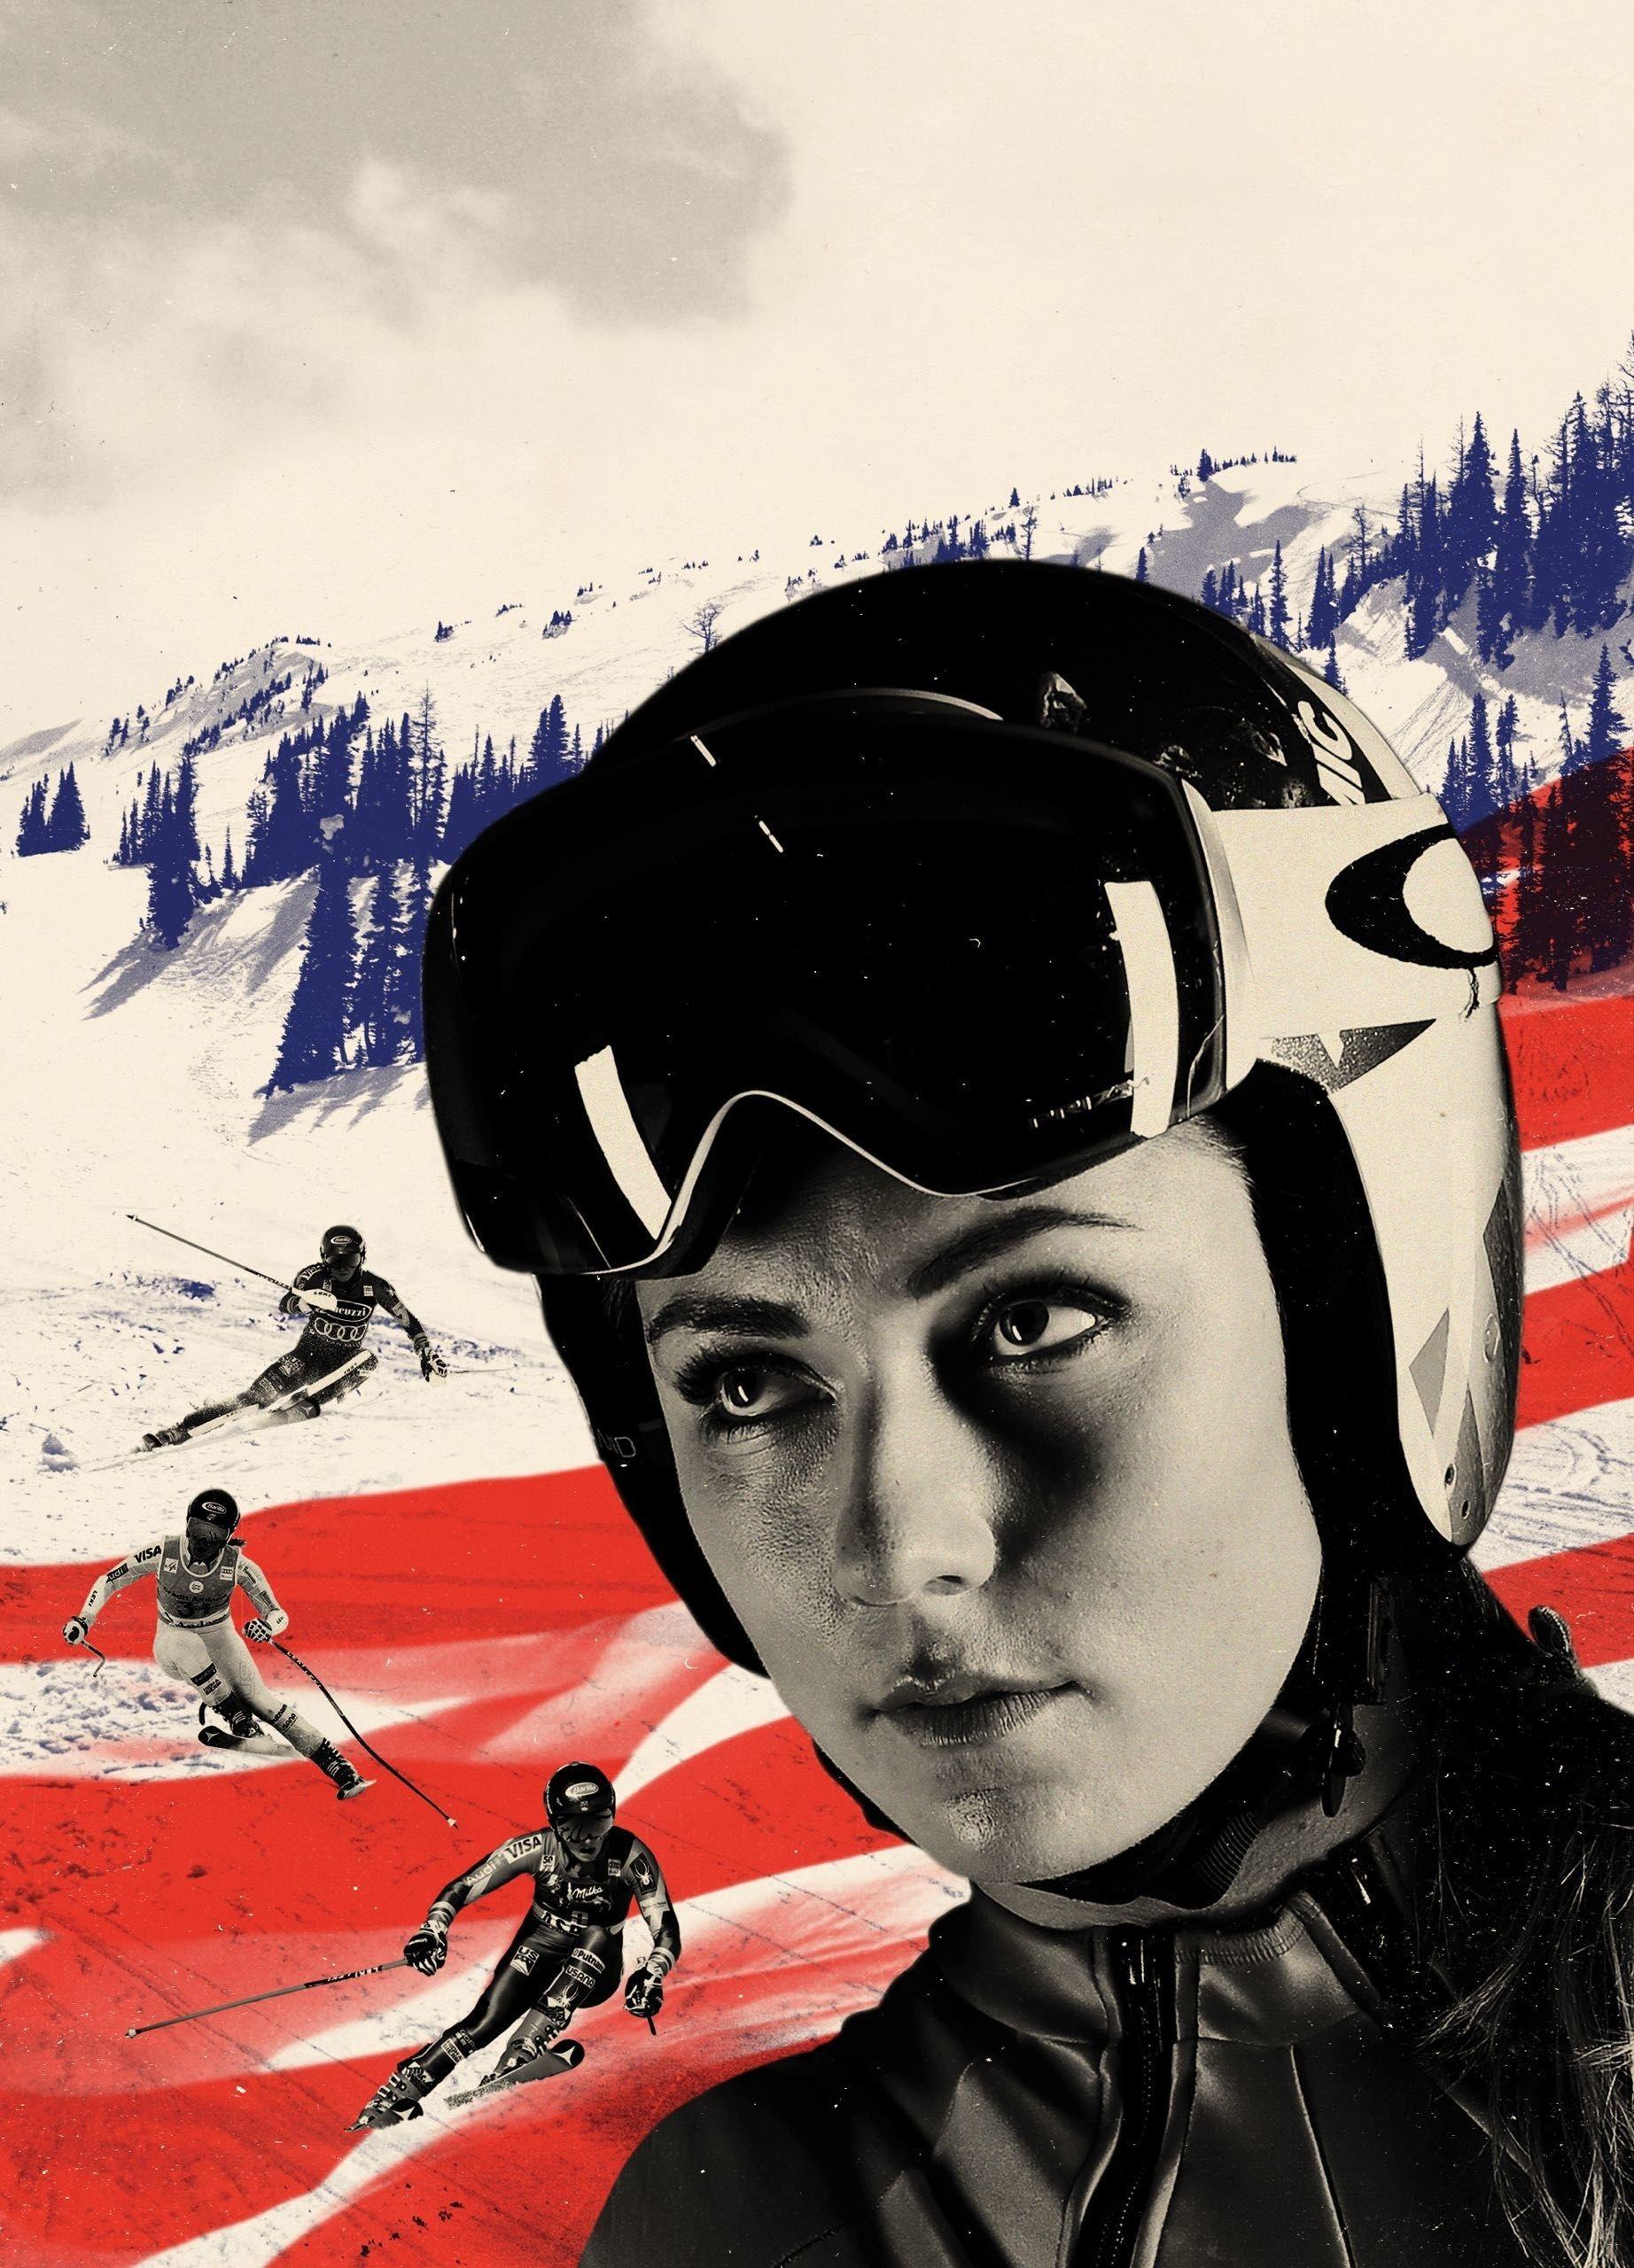 Mikaela Shiffrin, the Best Slalom Skier in the World | The New Yorker